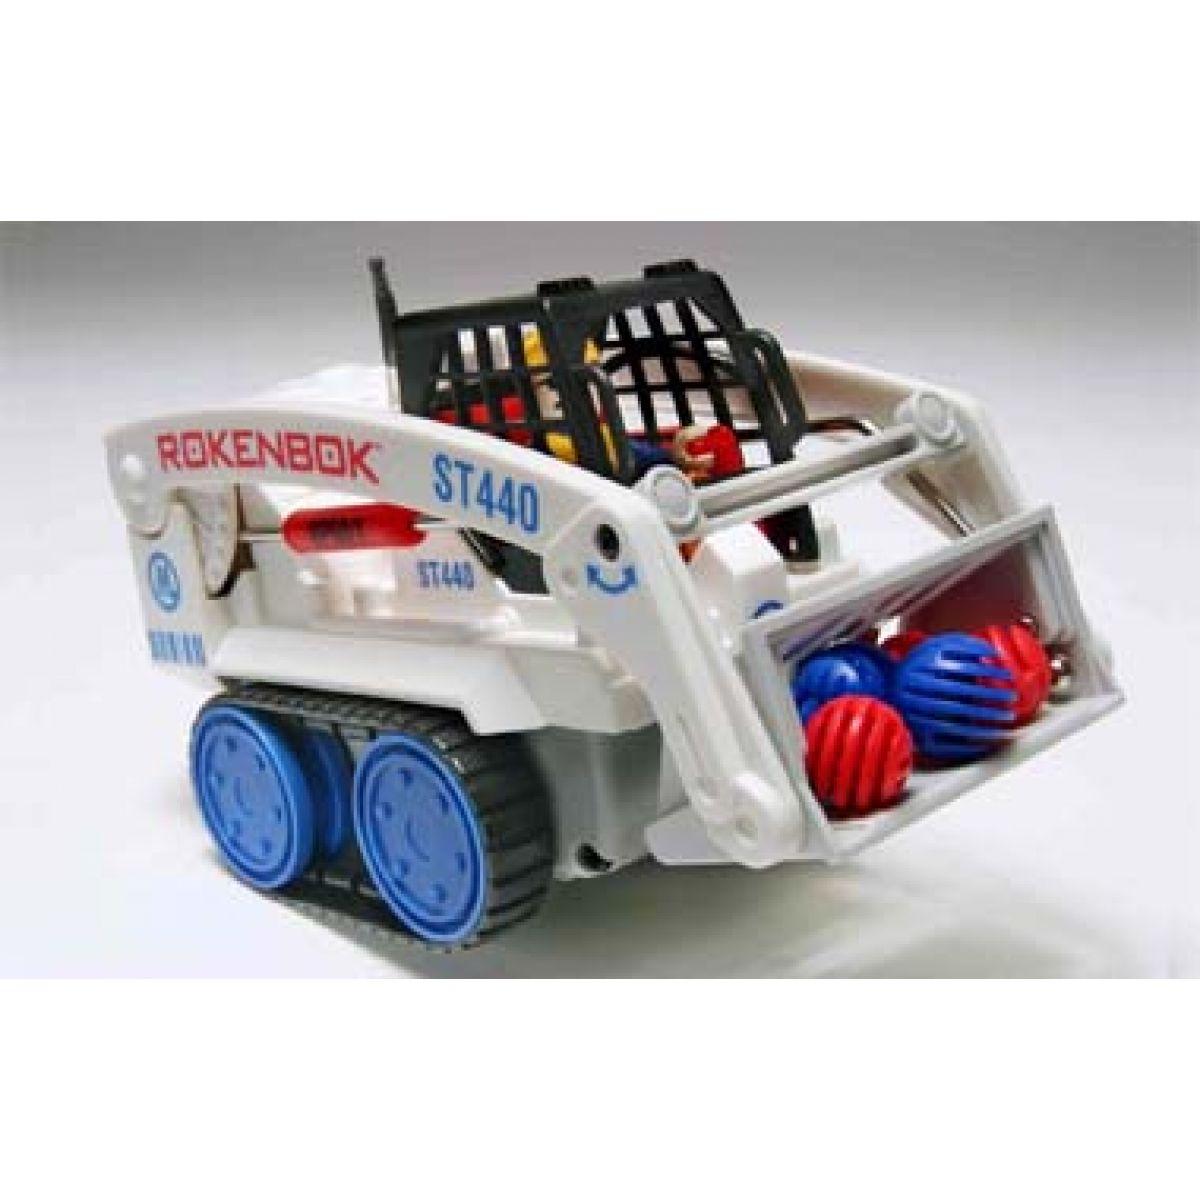 Rokenbok RC buldozer